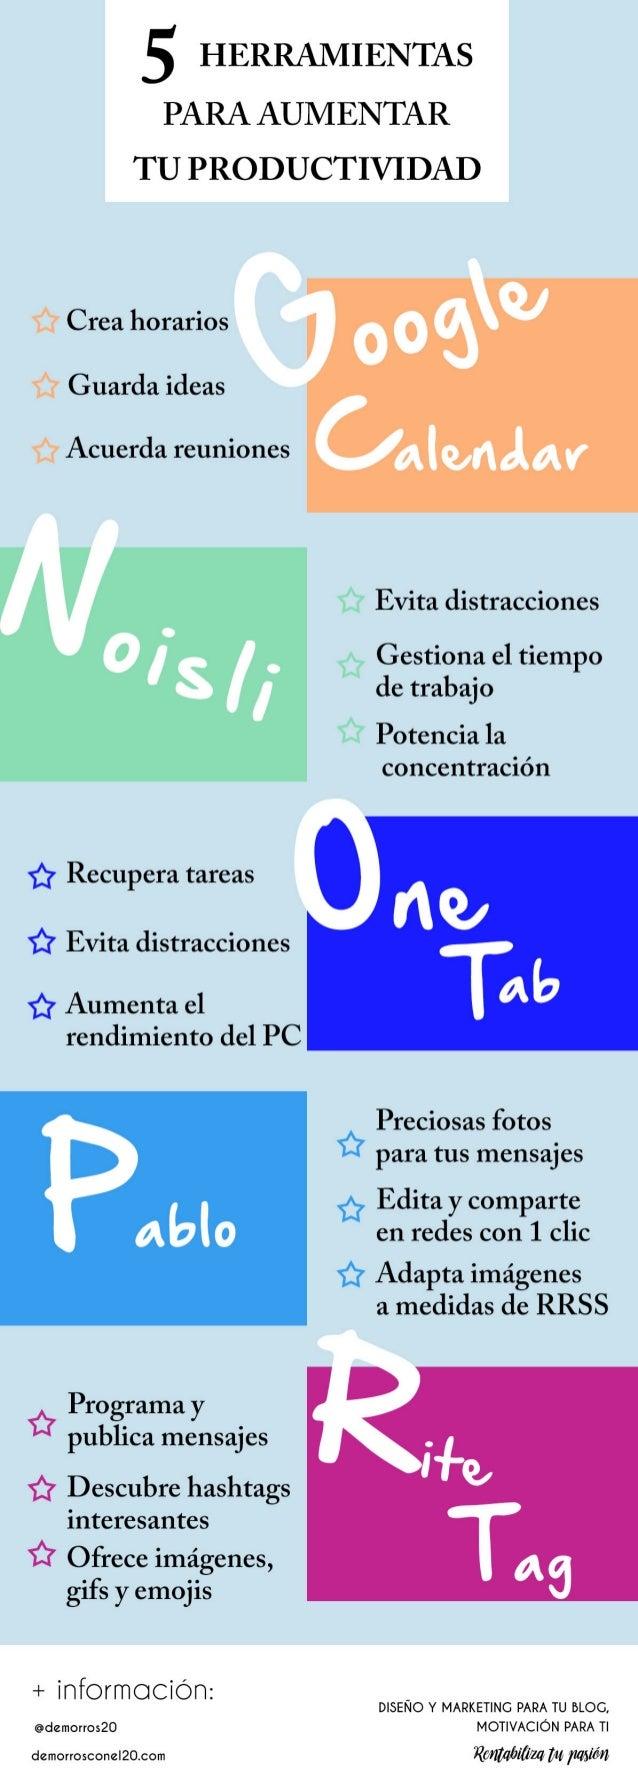 Infografia 5 herramientas maravillosas para aumentar tu productividad